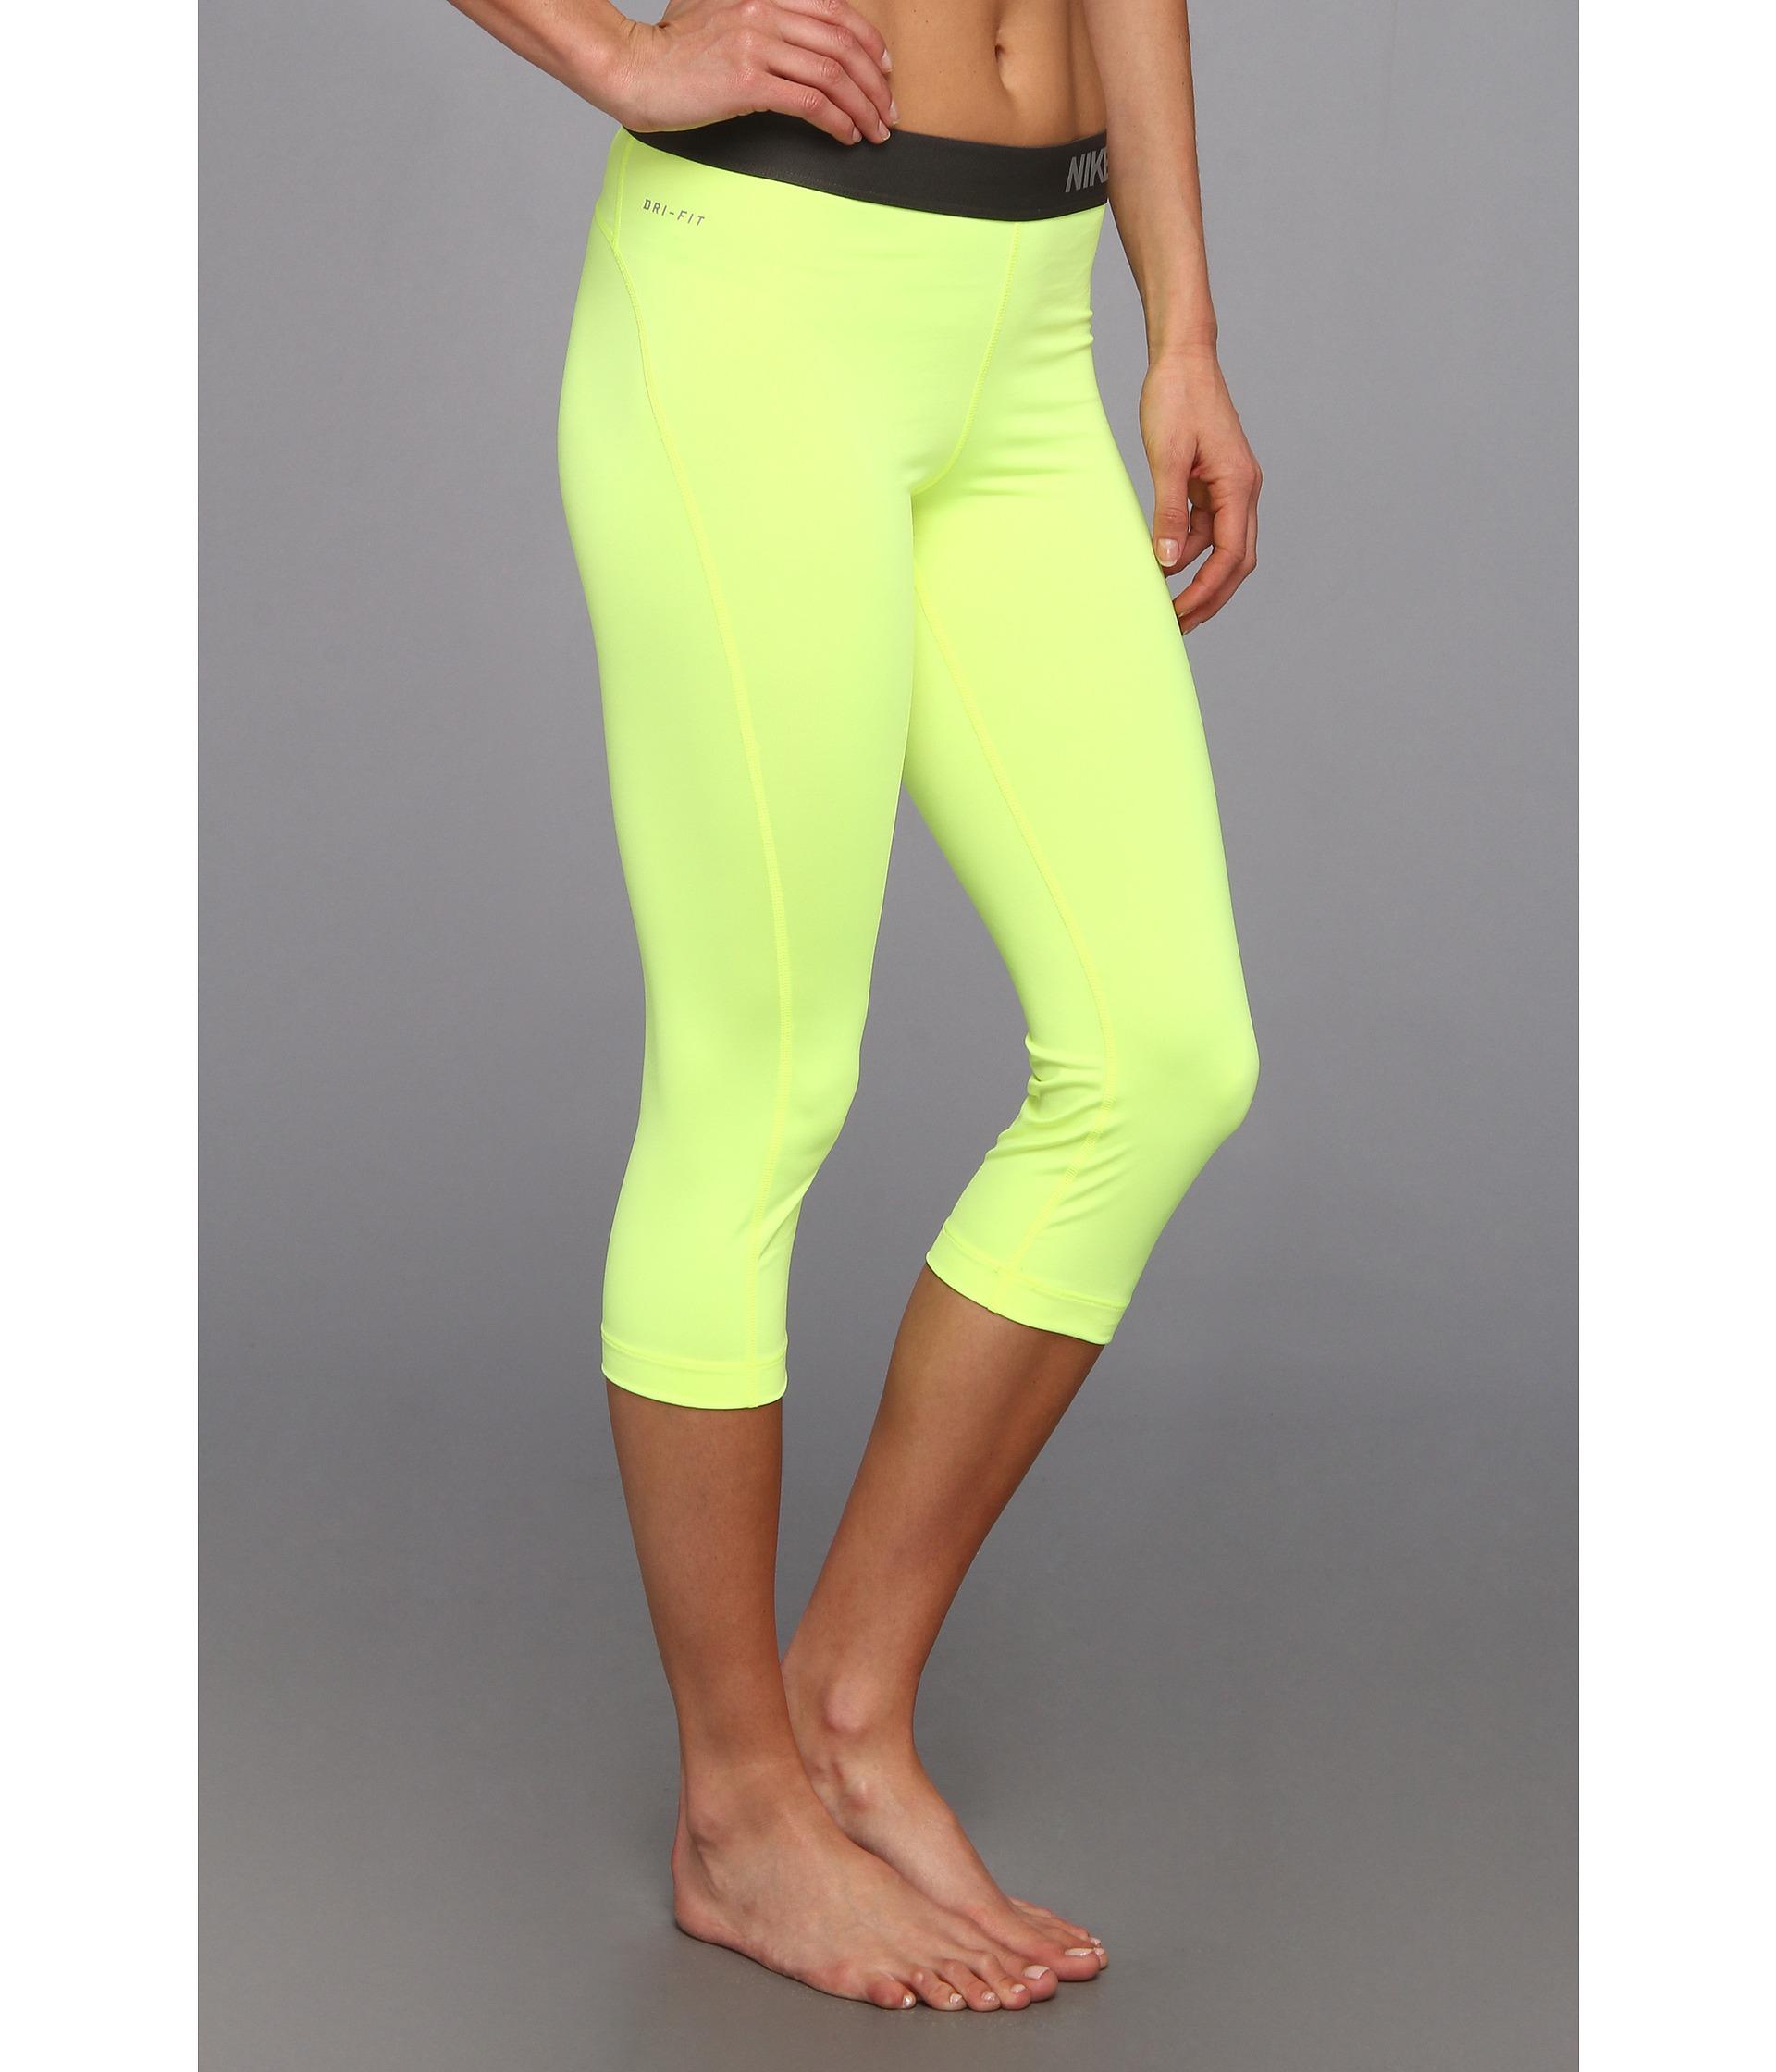 528d6d6160dc6 Nike Pro Capri in Yellow - Lyst